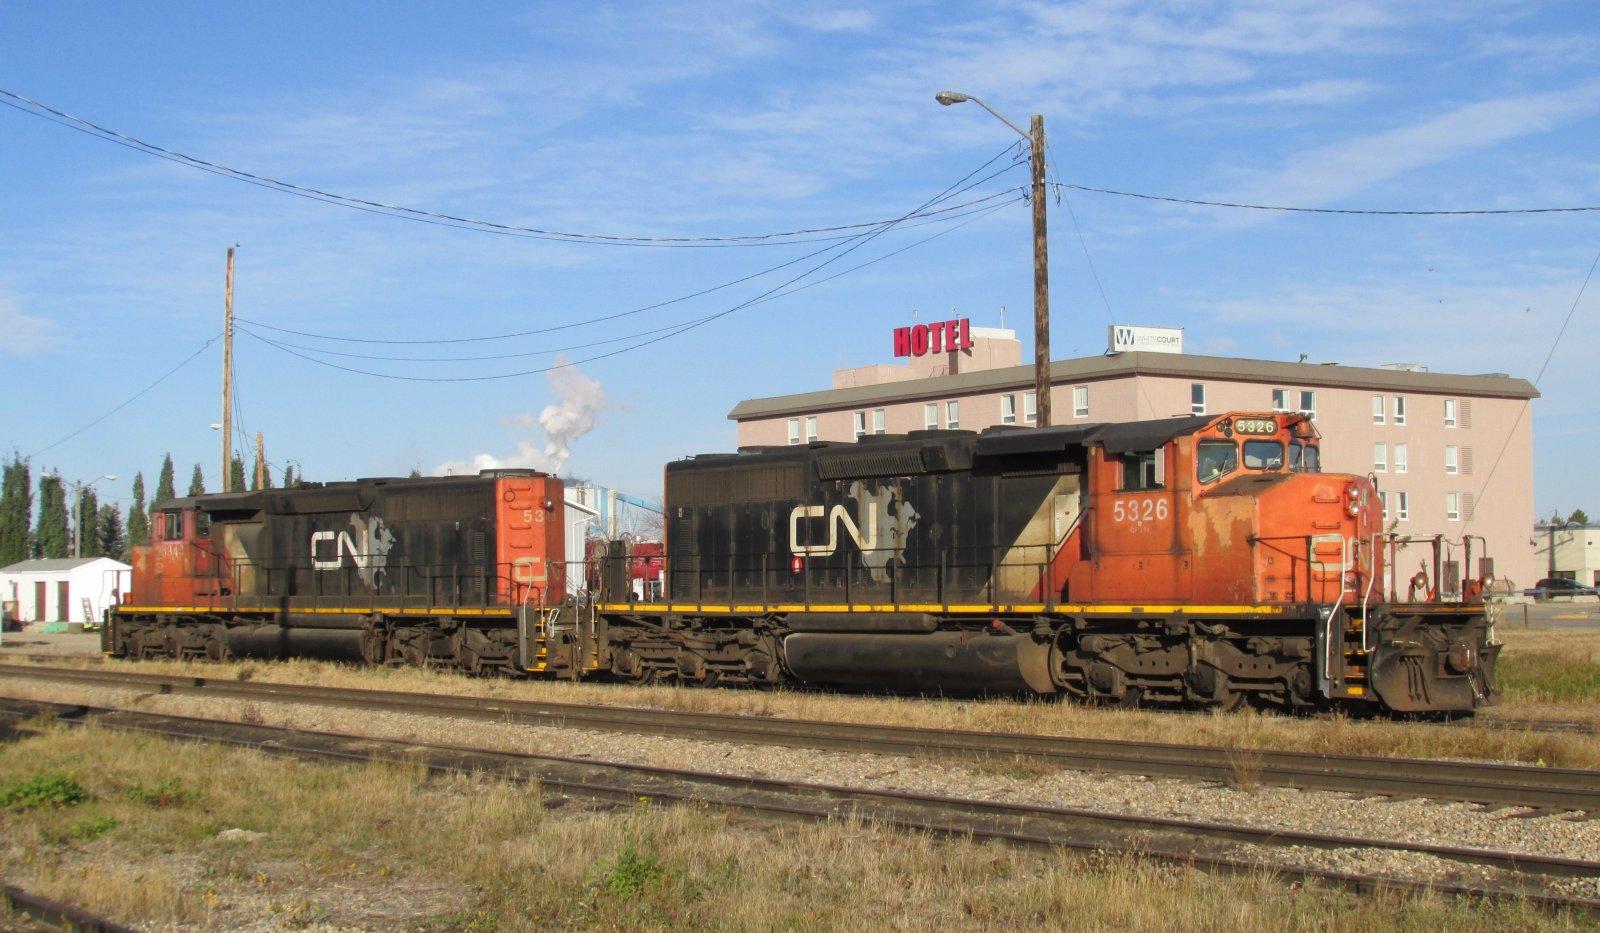 CN 5343_5326_10-06-2020.jpg